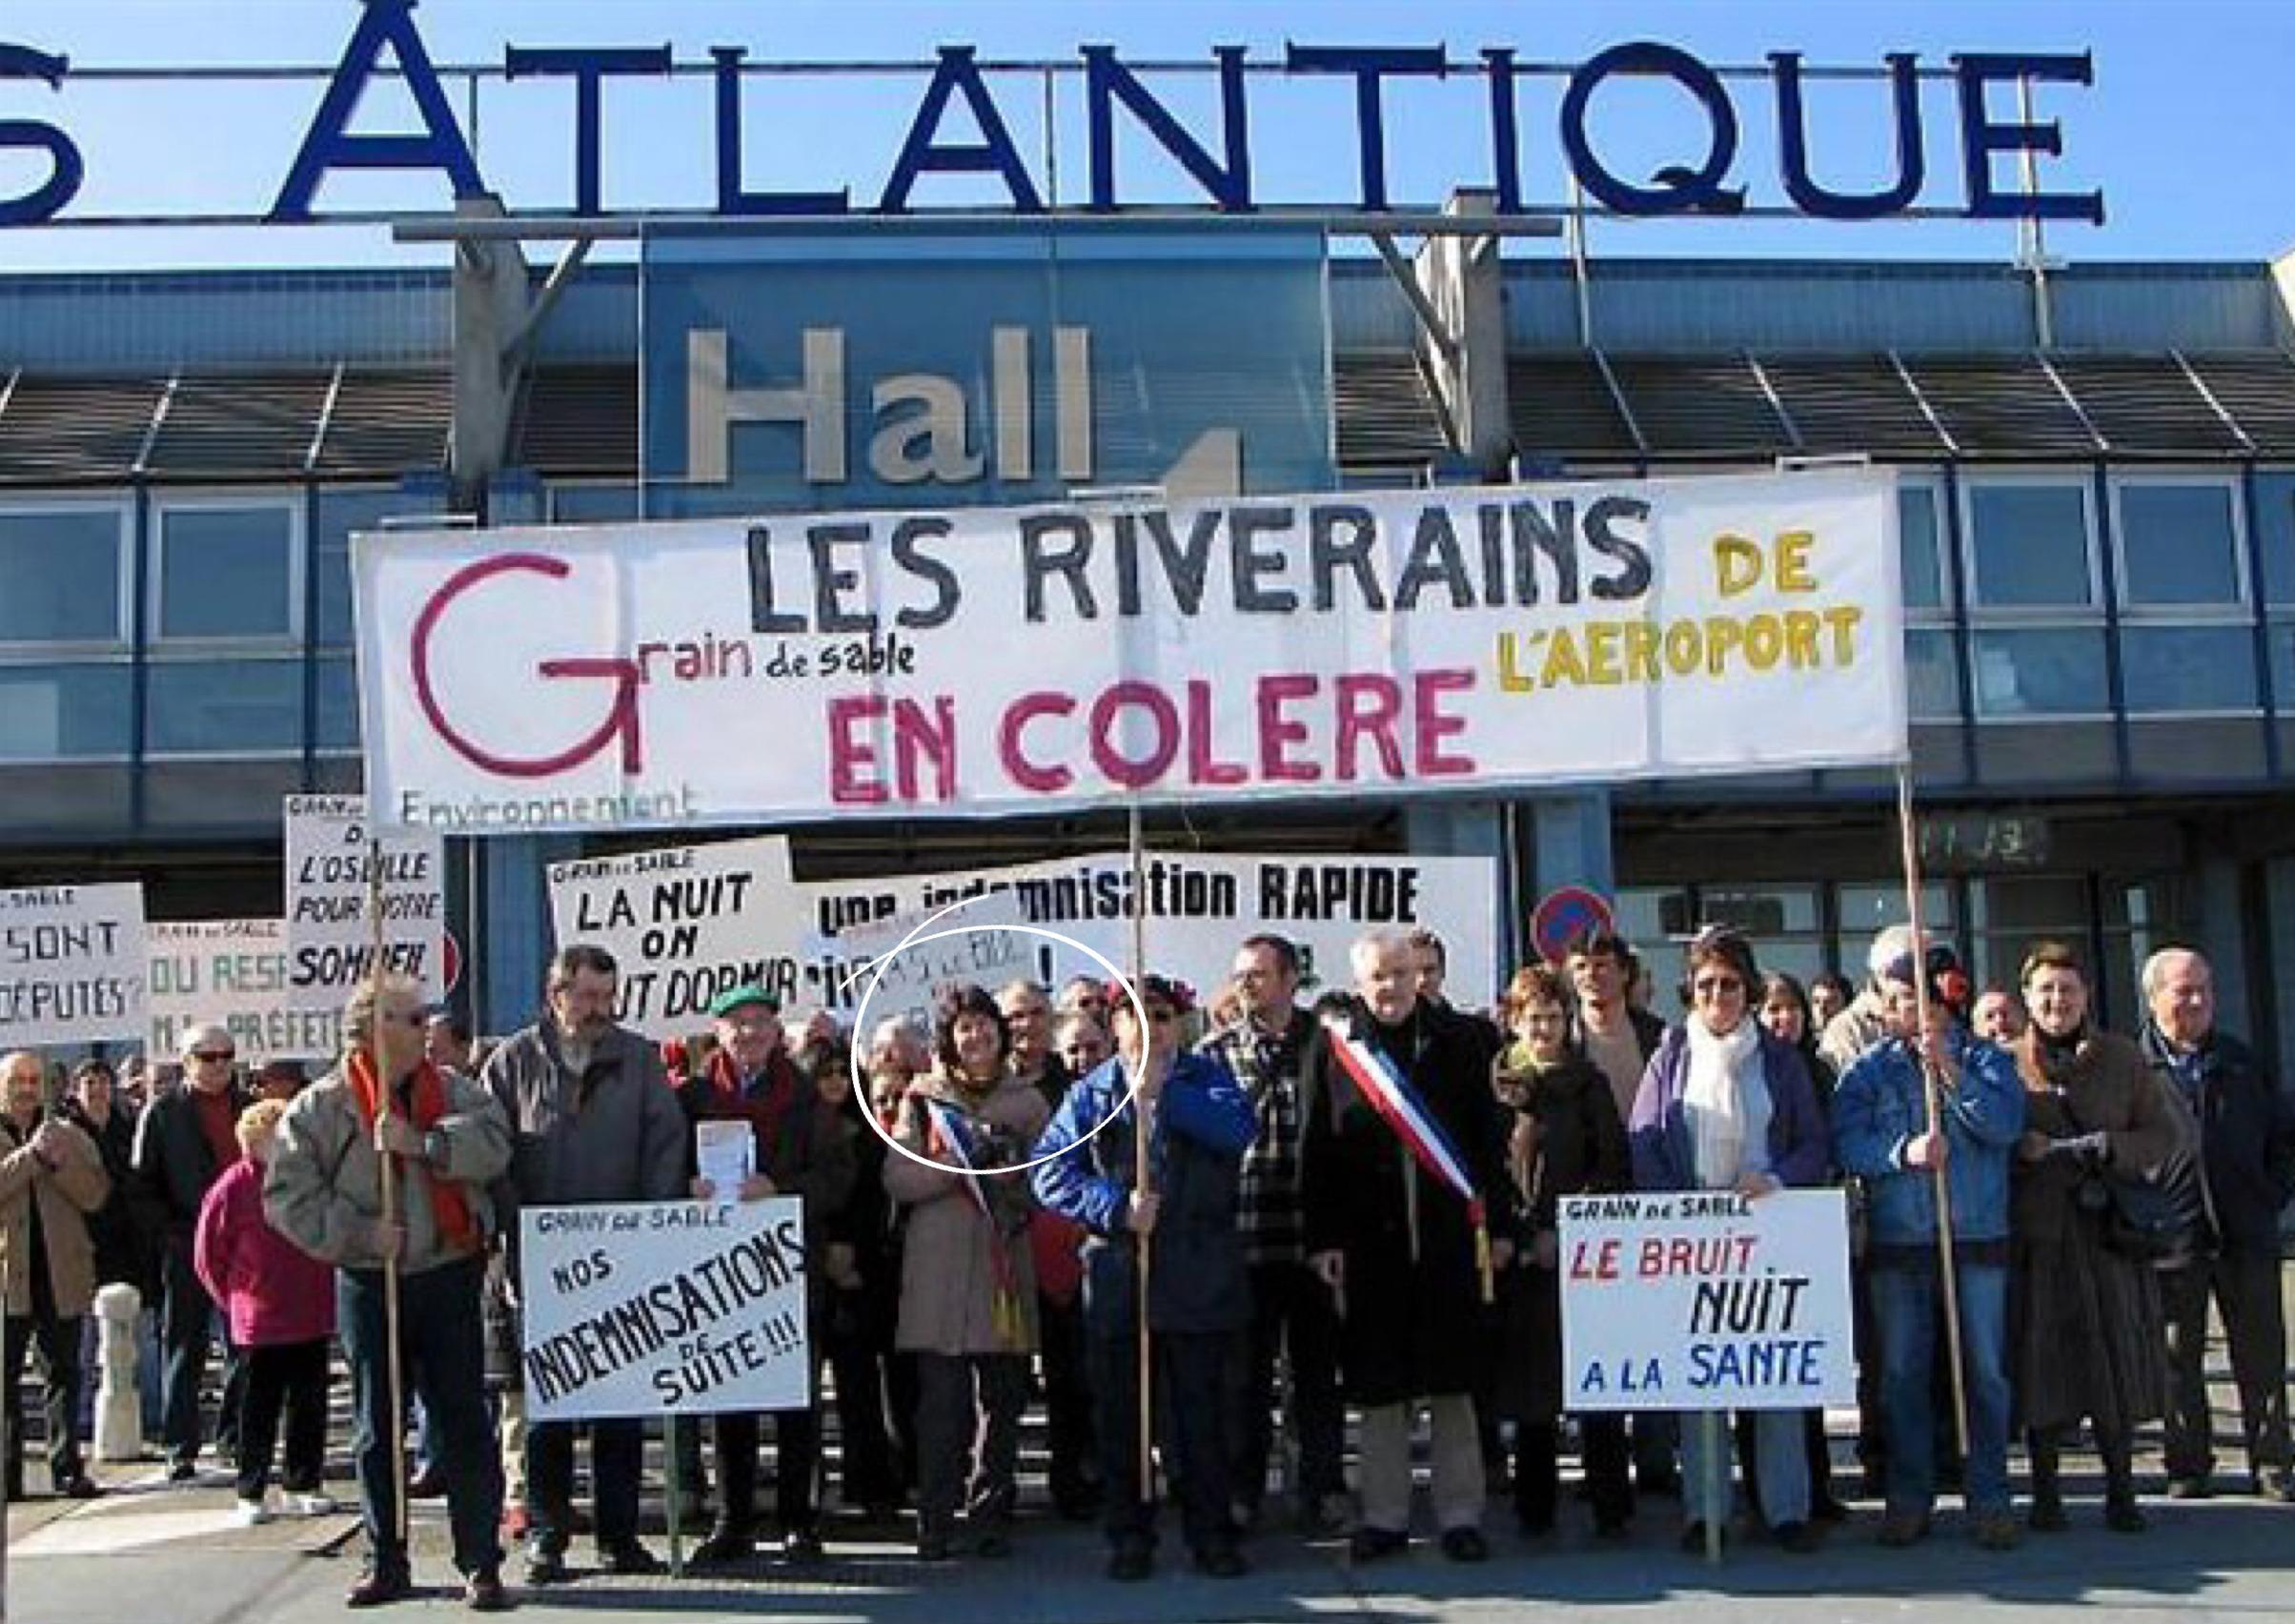 manifestation aéroport Françoise Verchère, Françoise Verchère, Bouguenais, aéroport Notre-Dame-des-Landes, NDDL